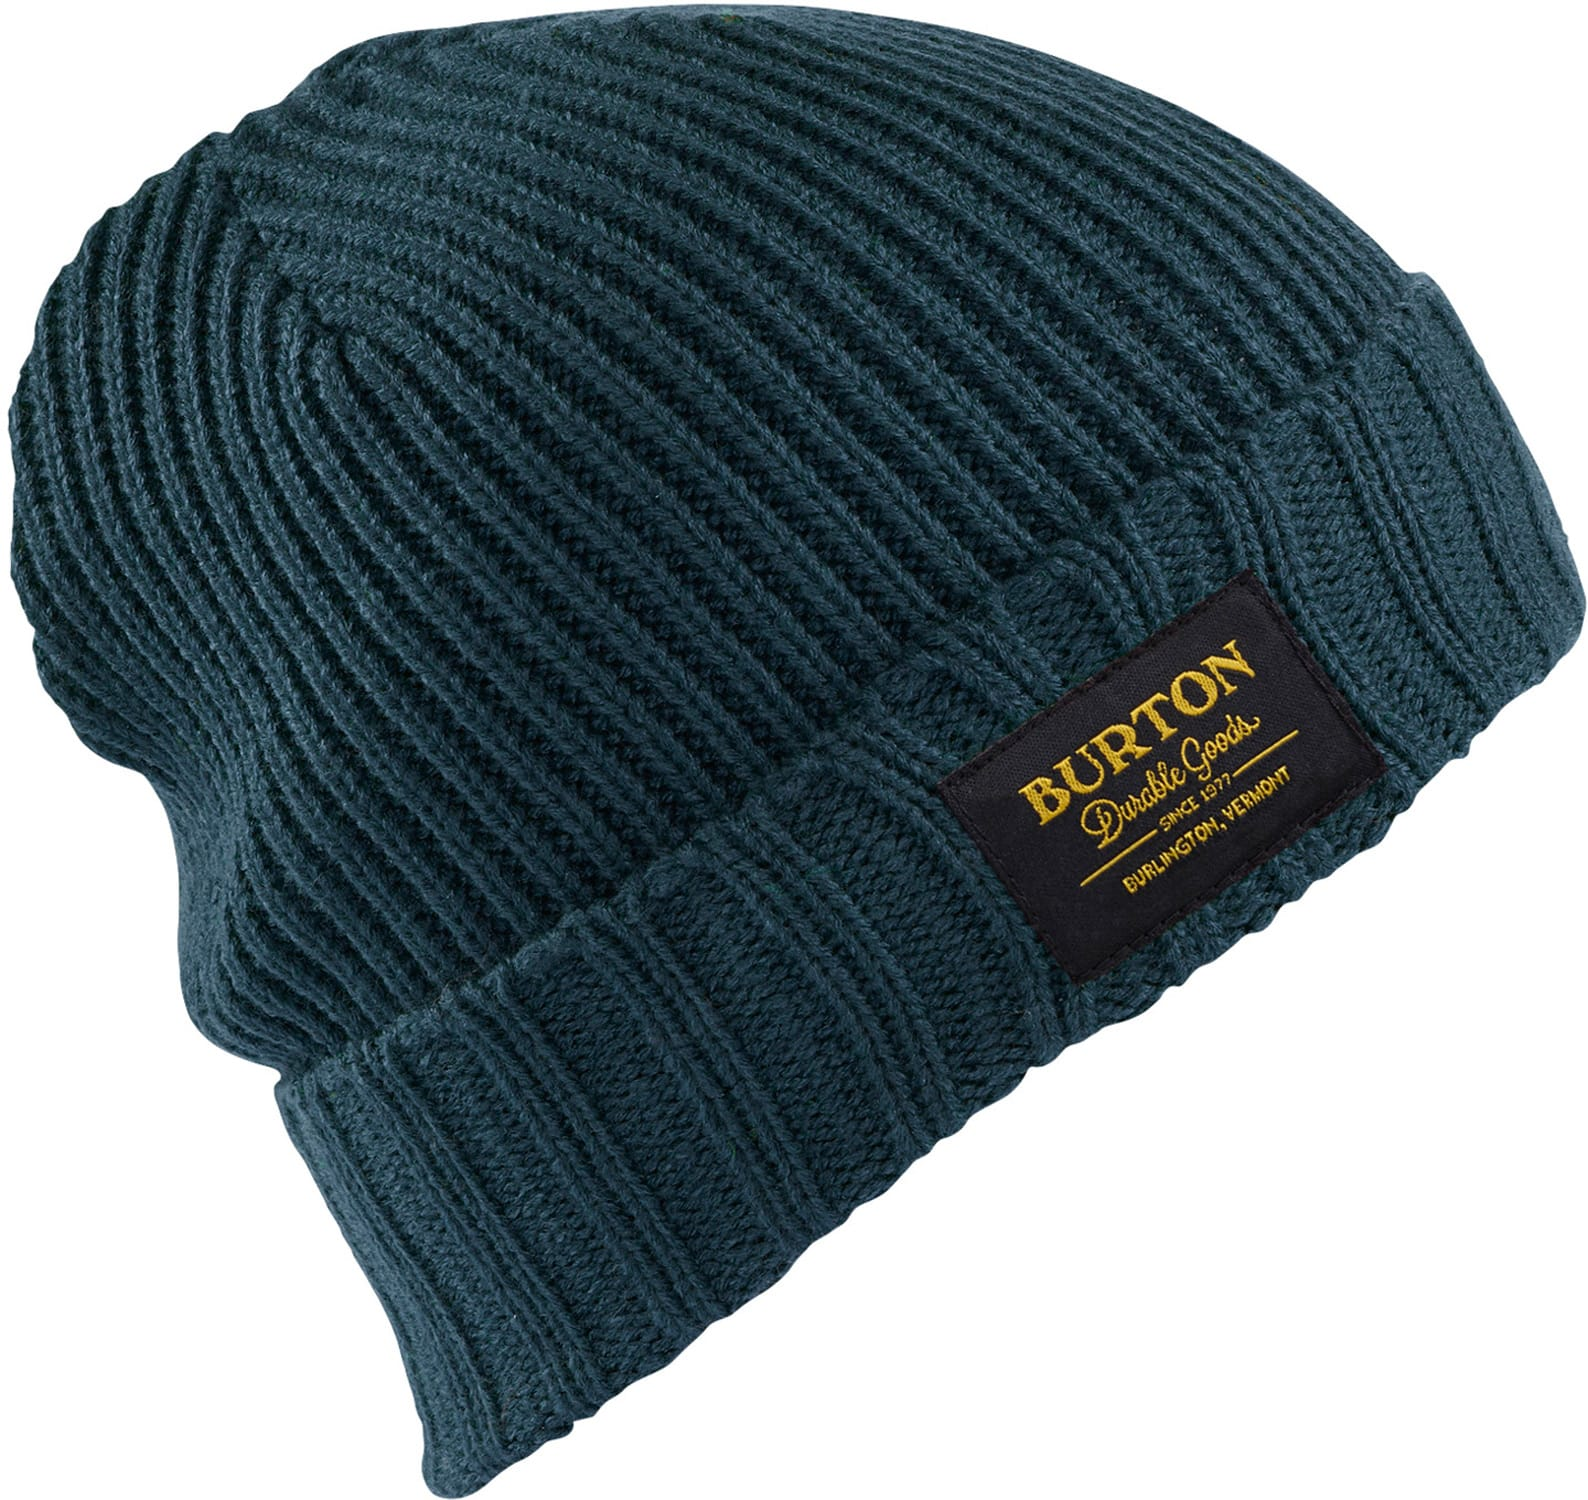 Burton Gringo Beanie bt8grgkbst18zz-burton-beanies